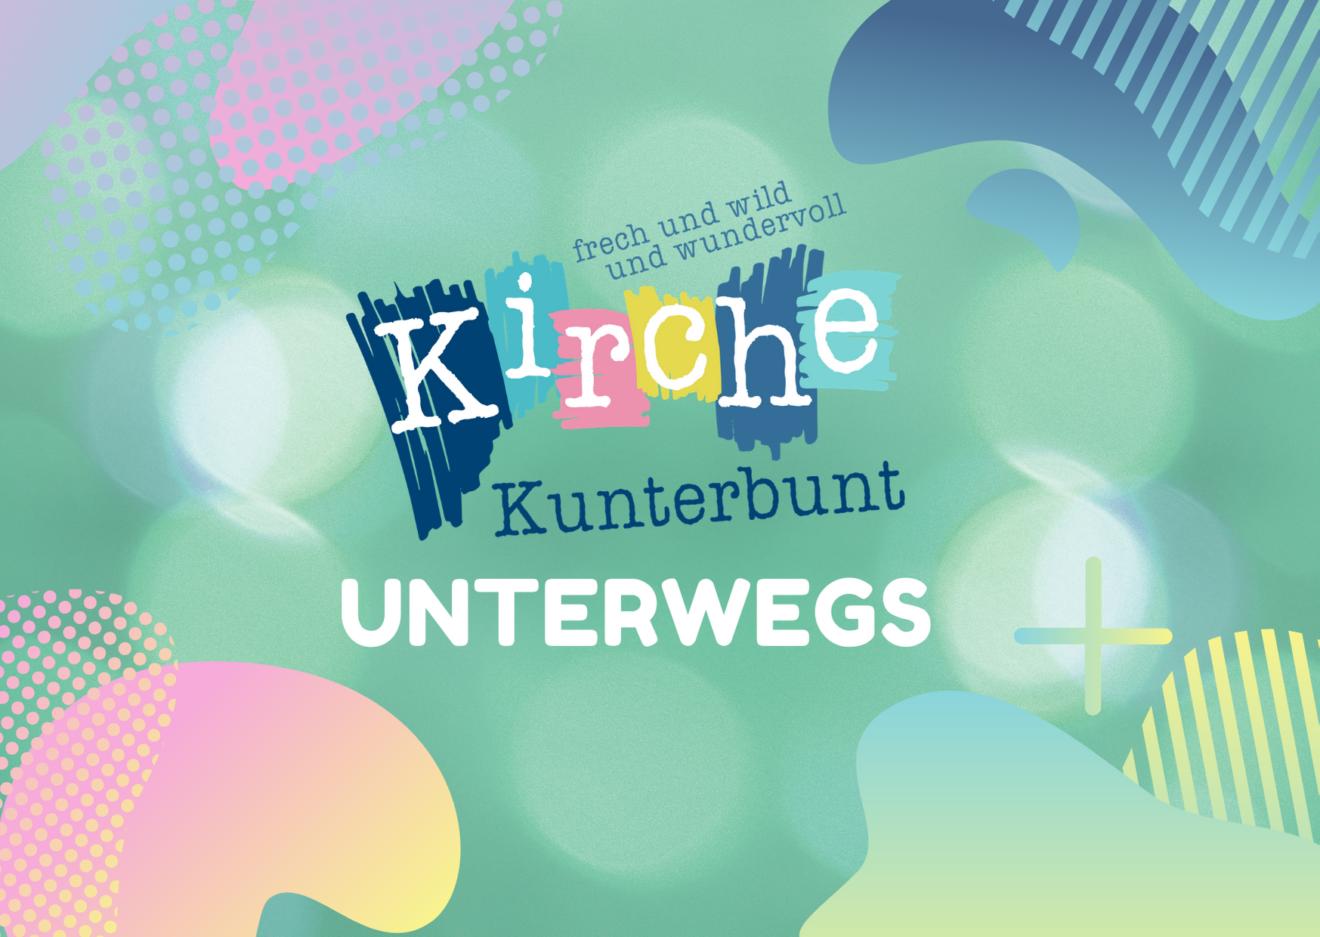 Kirche Kunterbunt -- Unterwegs!